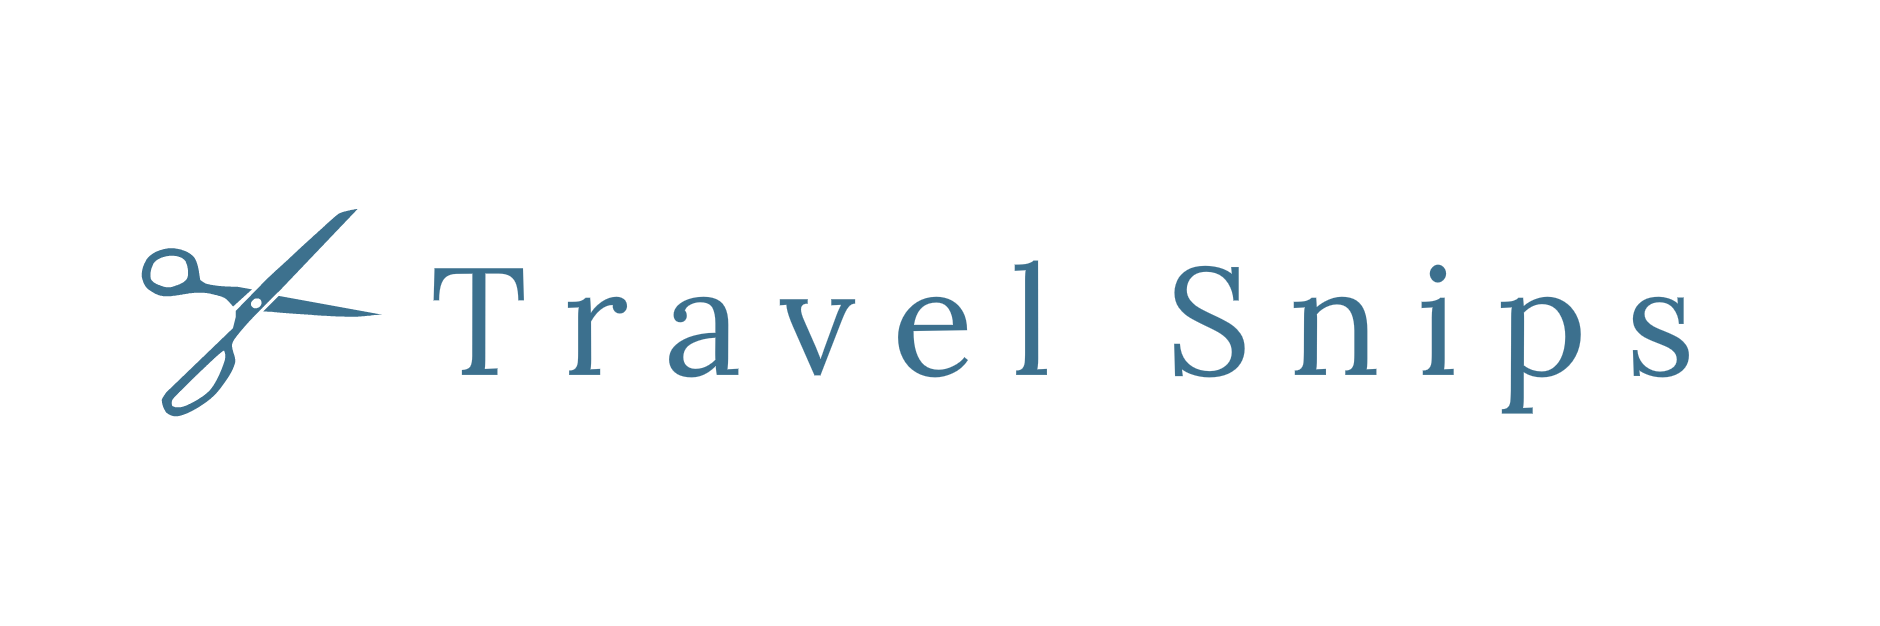 Travel Snips